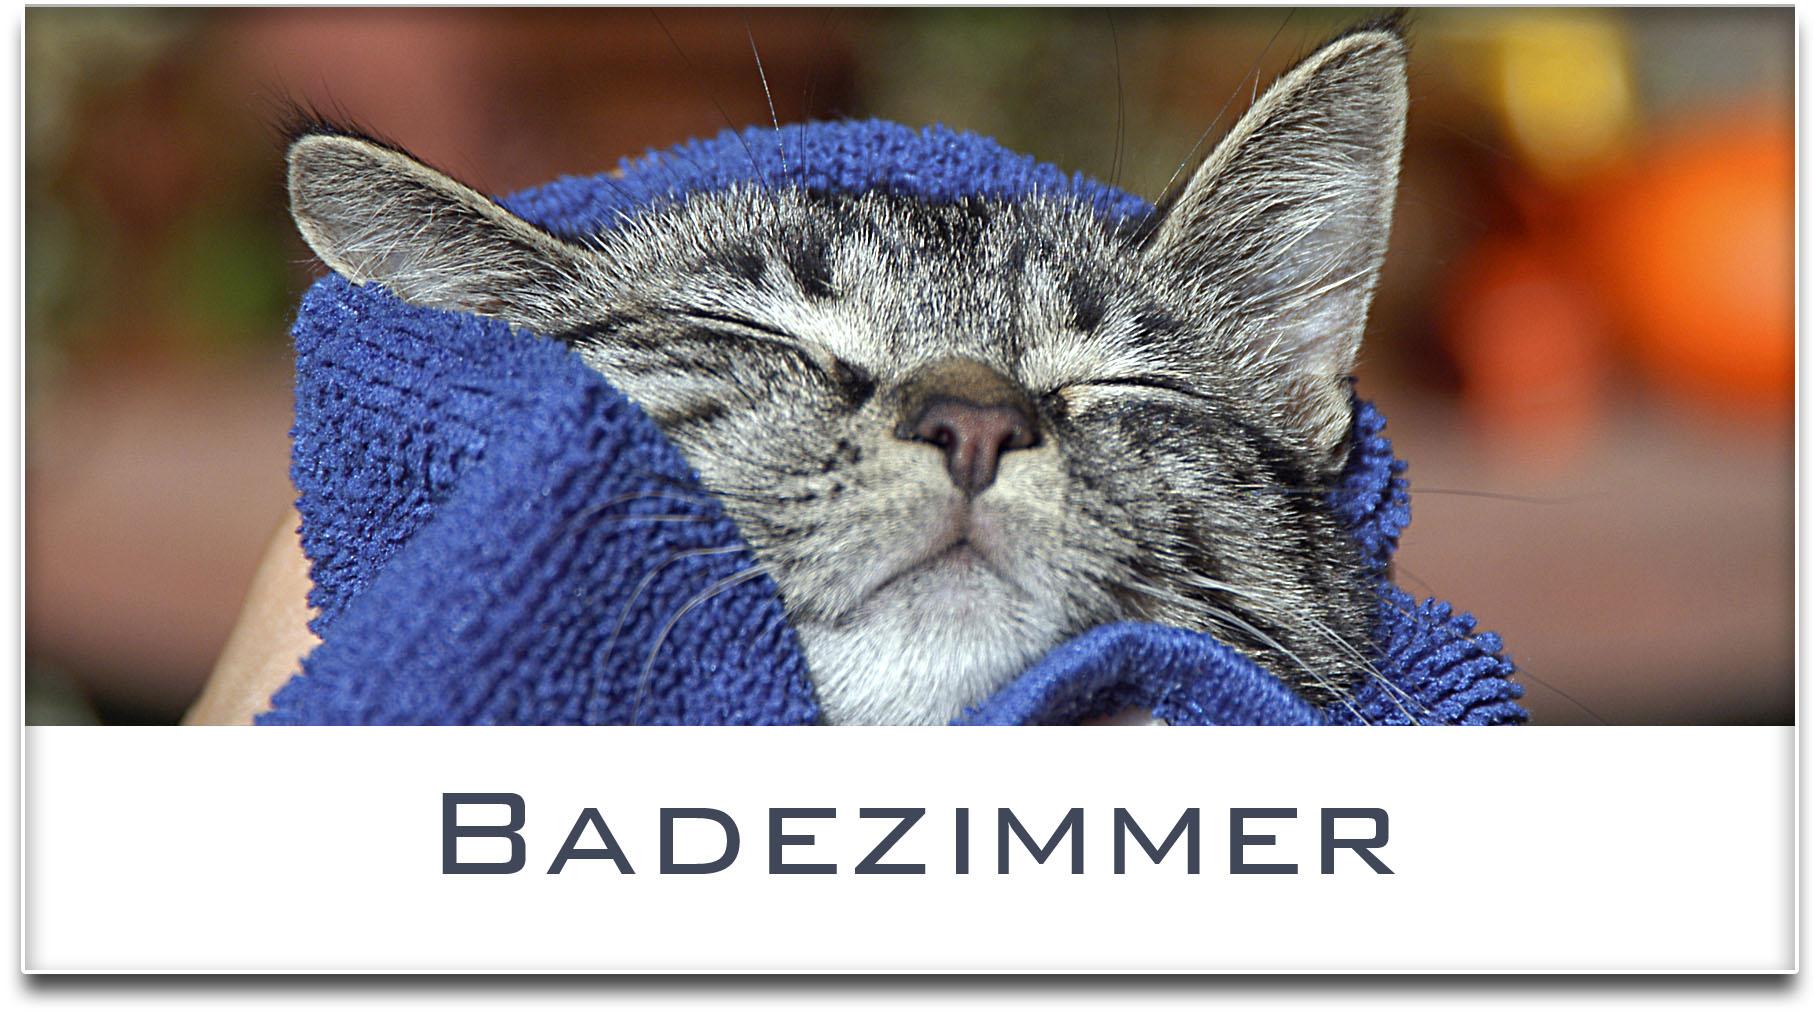 Türschild / Haustürschild / Katze / Badezimmer / Selbstklebend